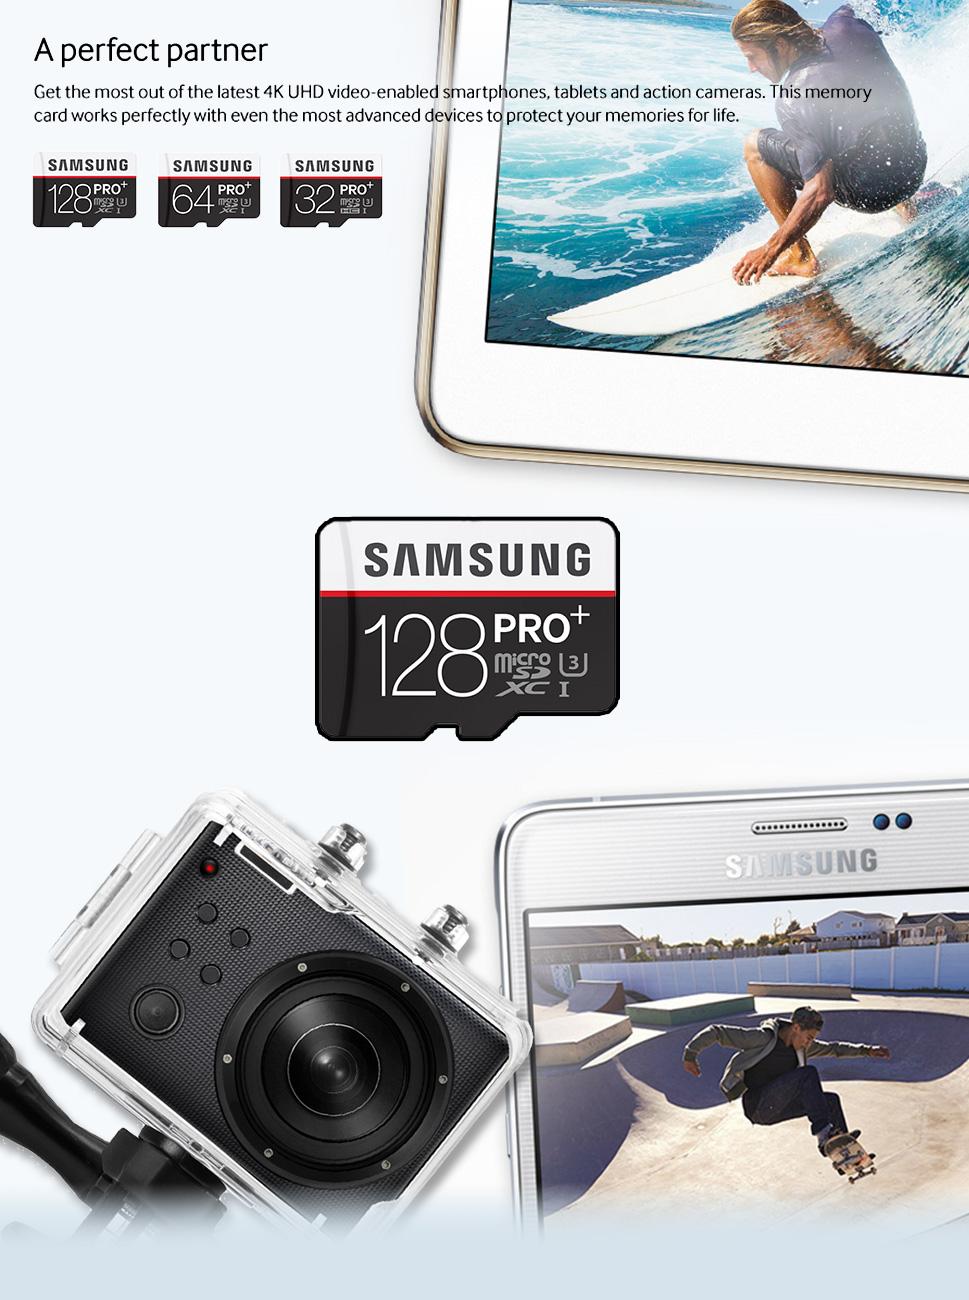 Sandisk mobile ultra microsdxc 64gb uhs i class 10 80mb for Mobilia webhallen